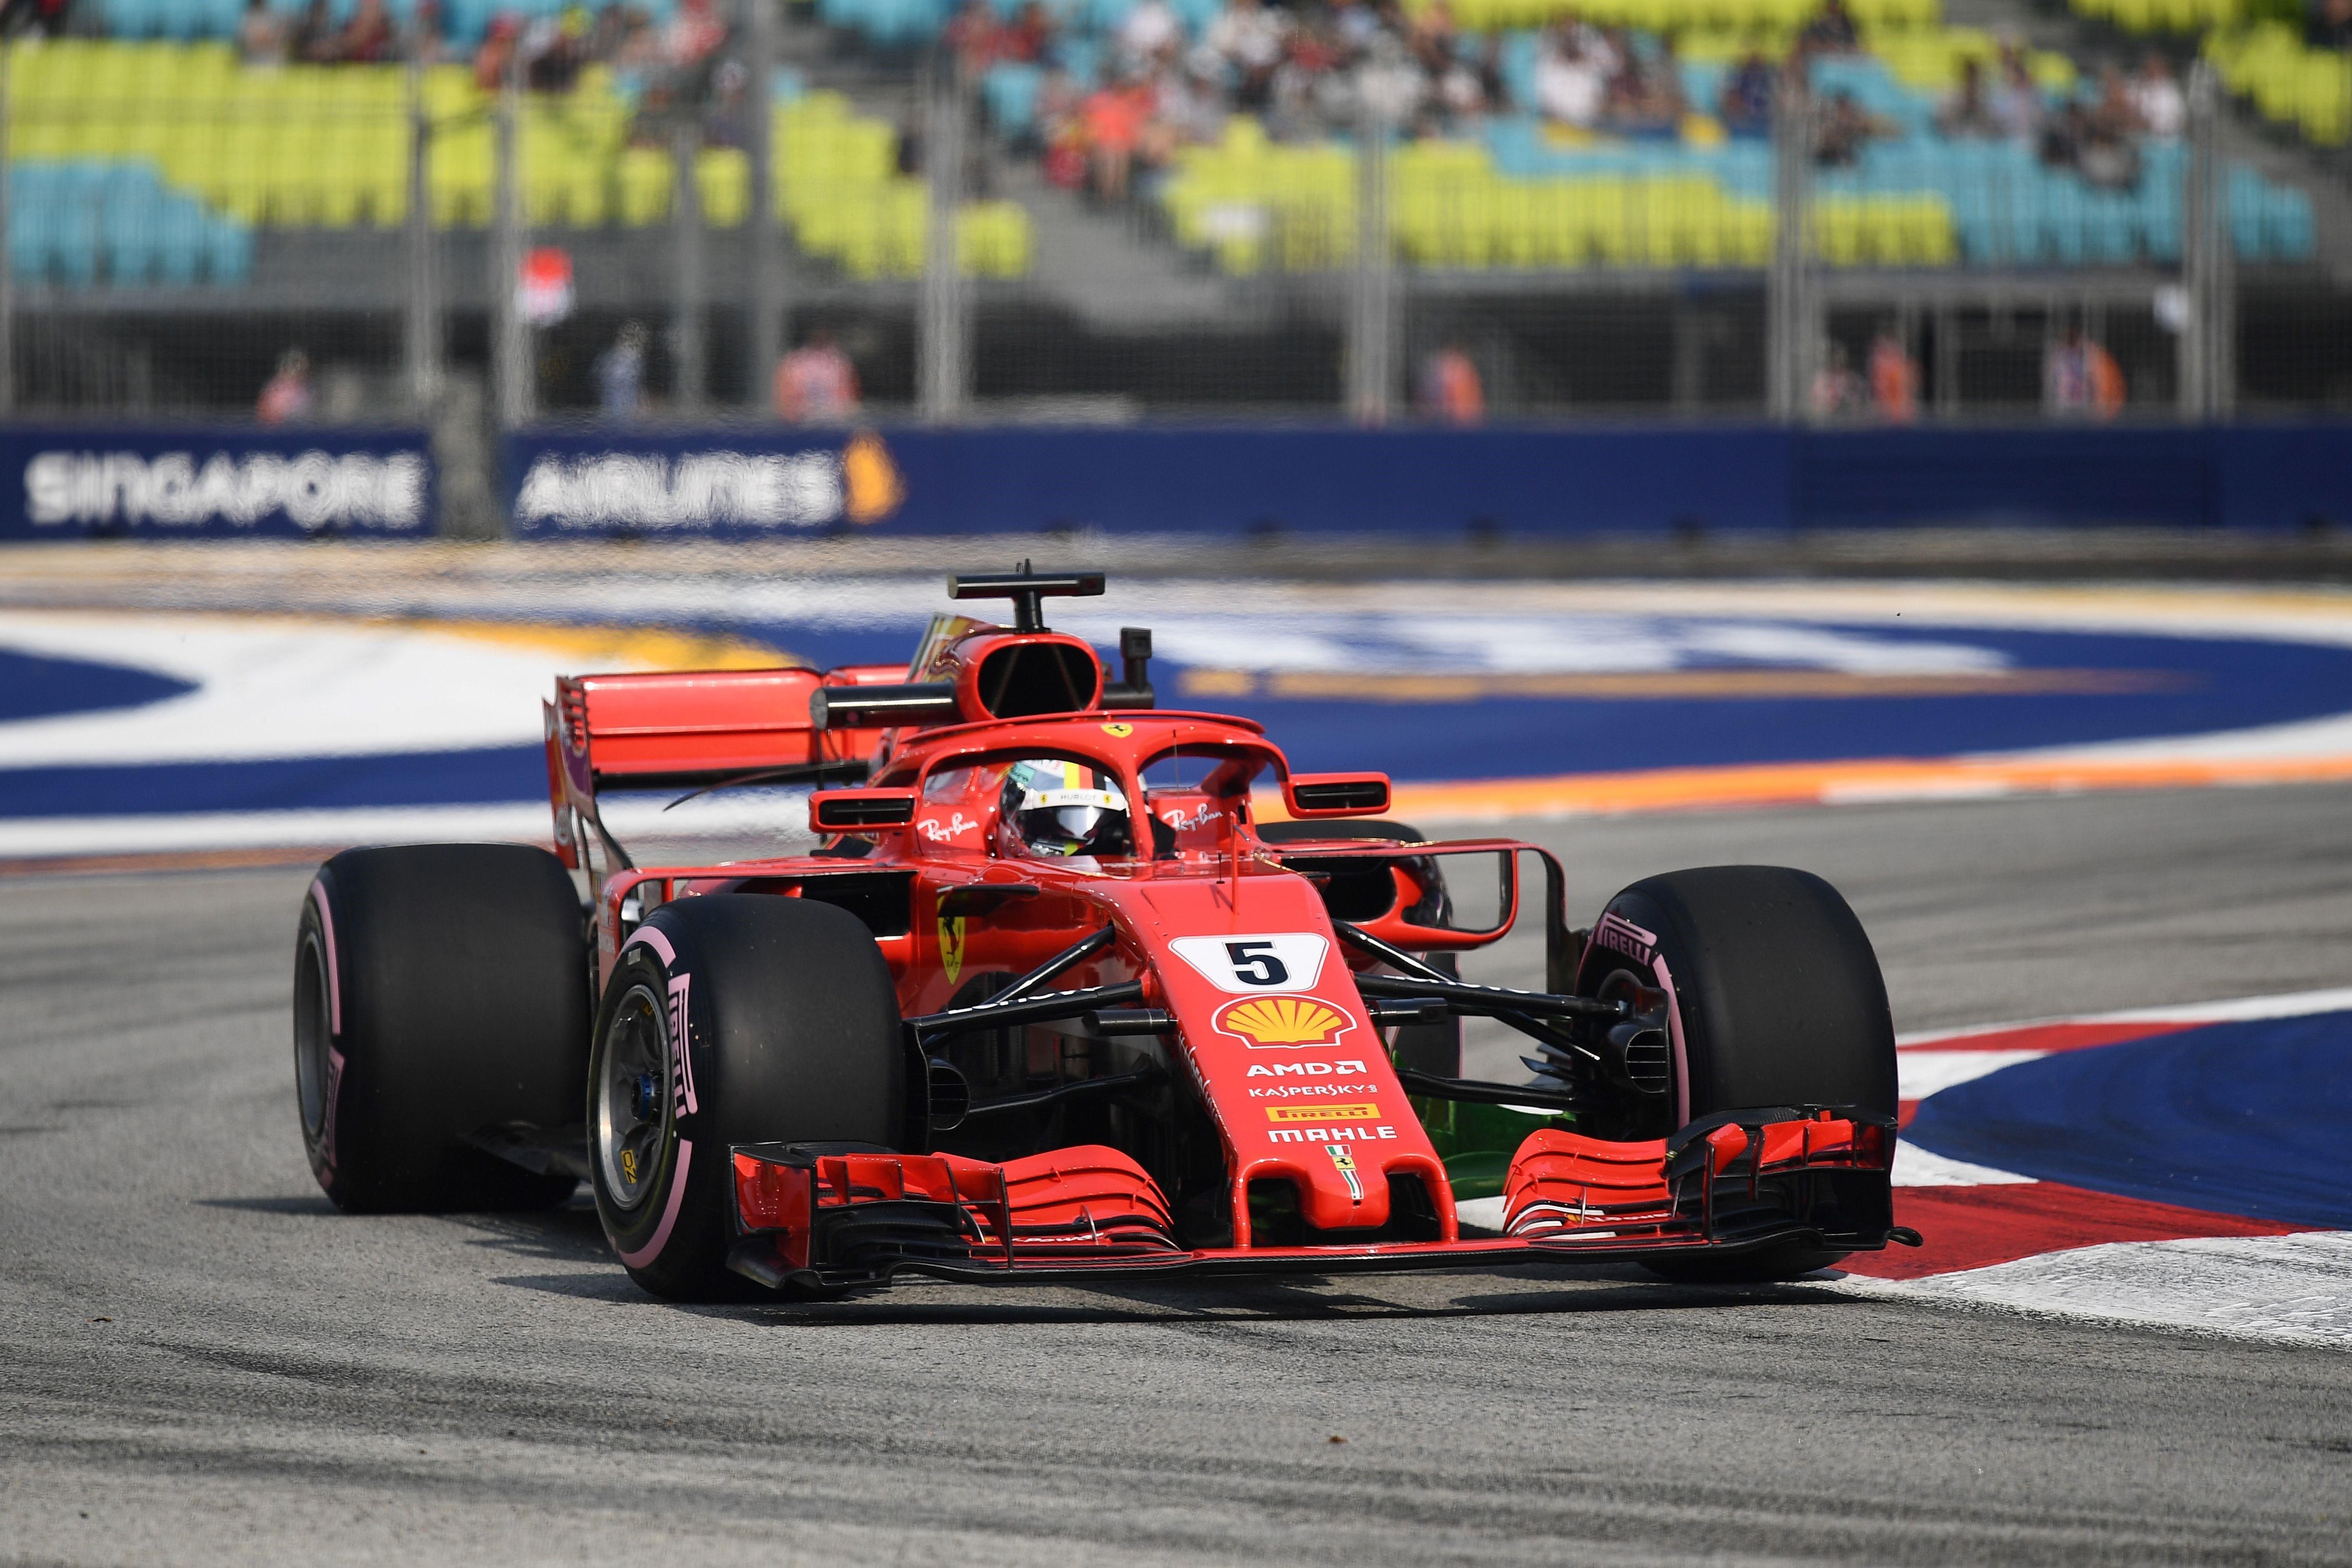 Sebastian Vettel (Ferrari) au Grand Prix de Singapour 2018